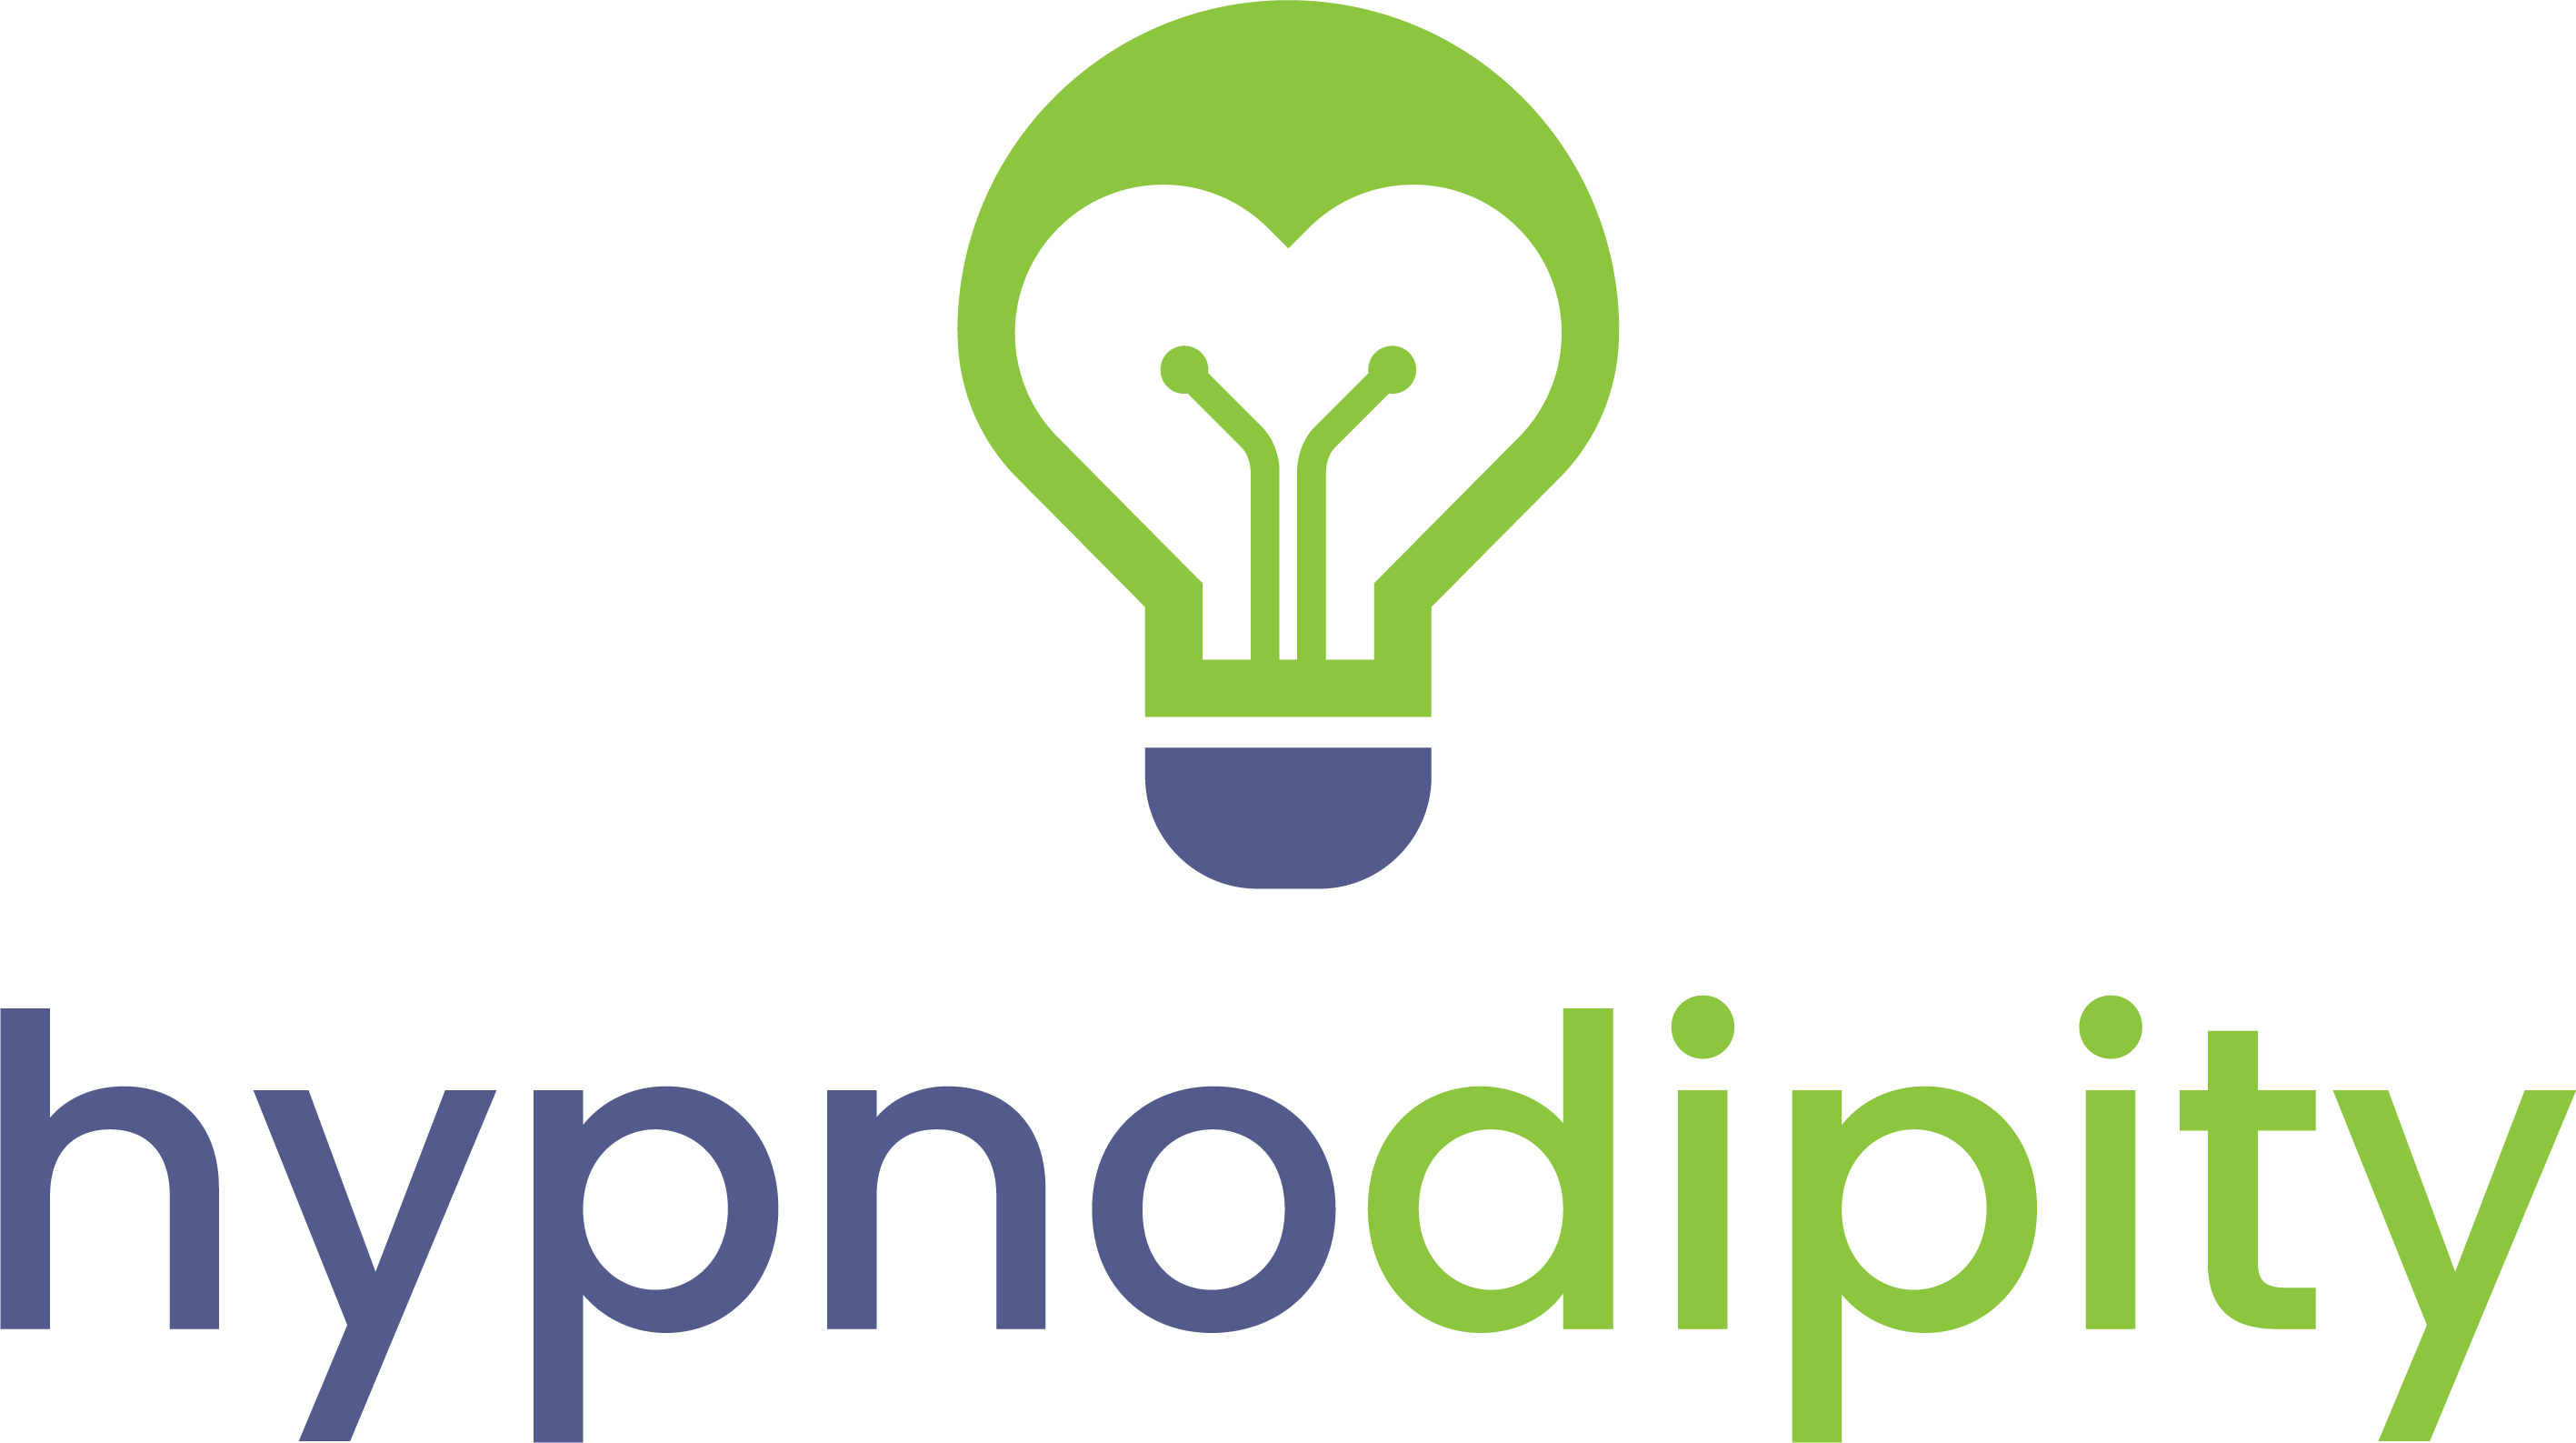 Hypnodipity logo